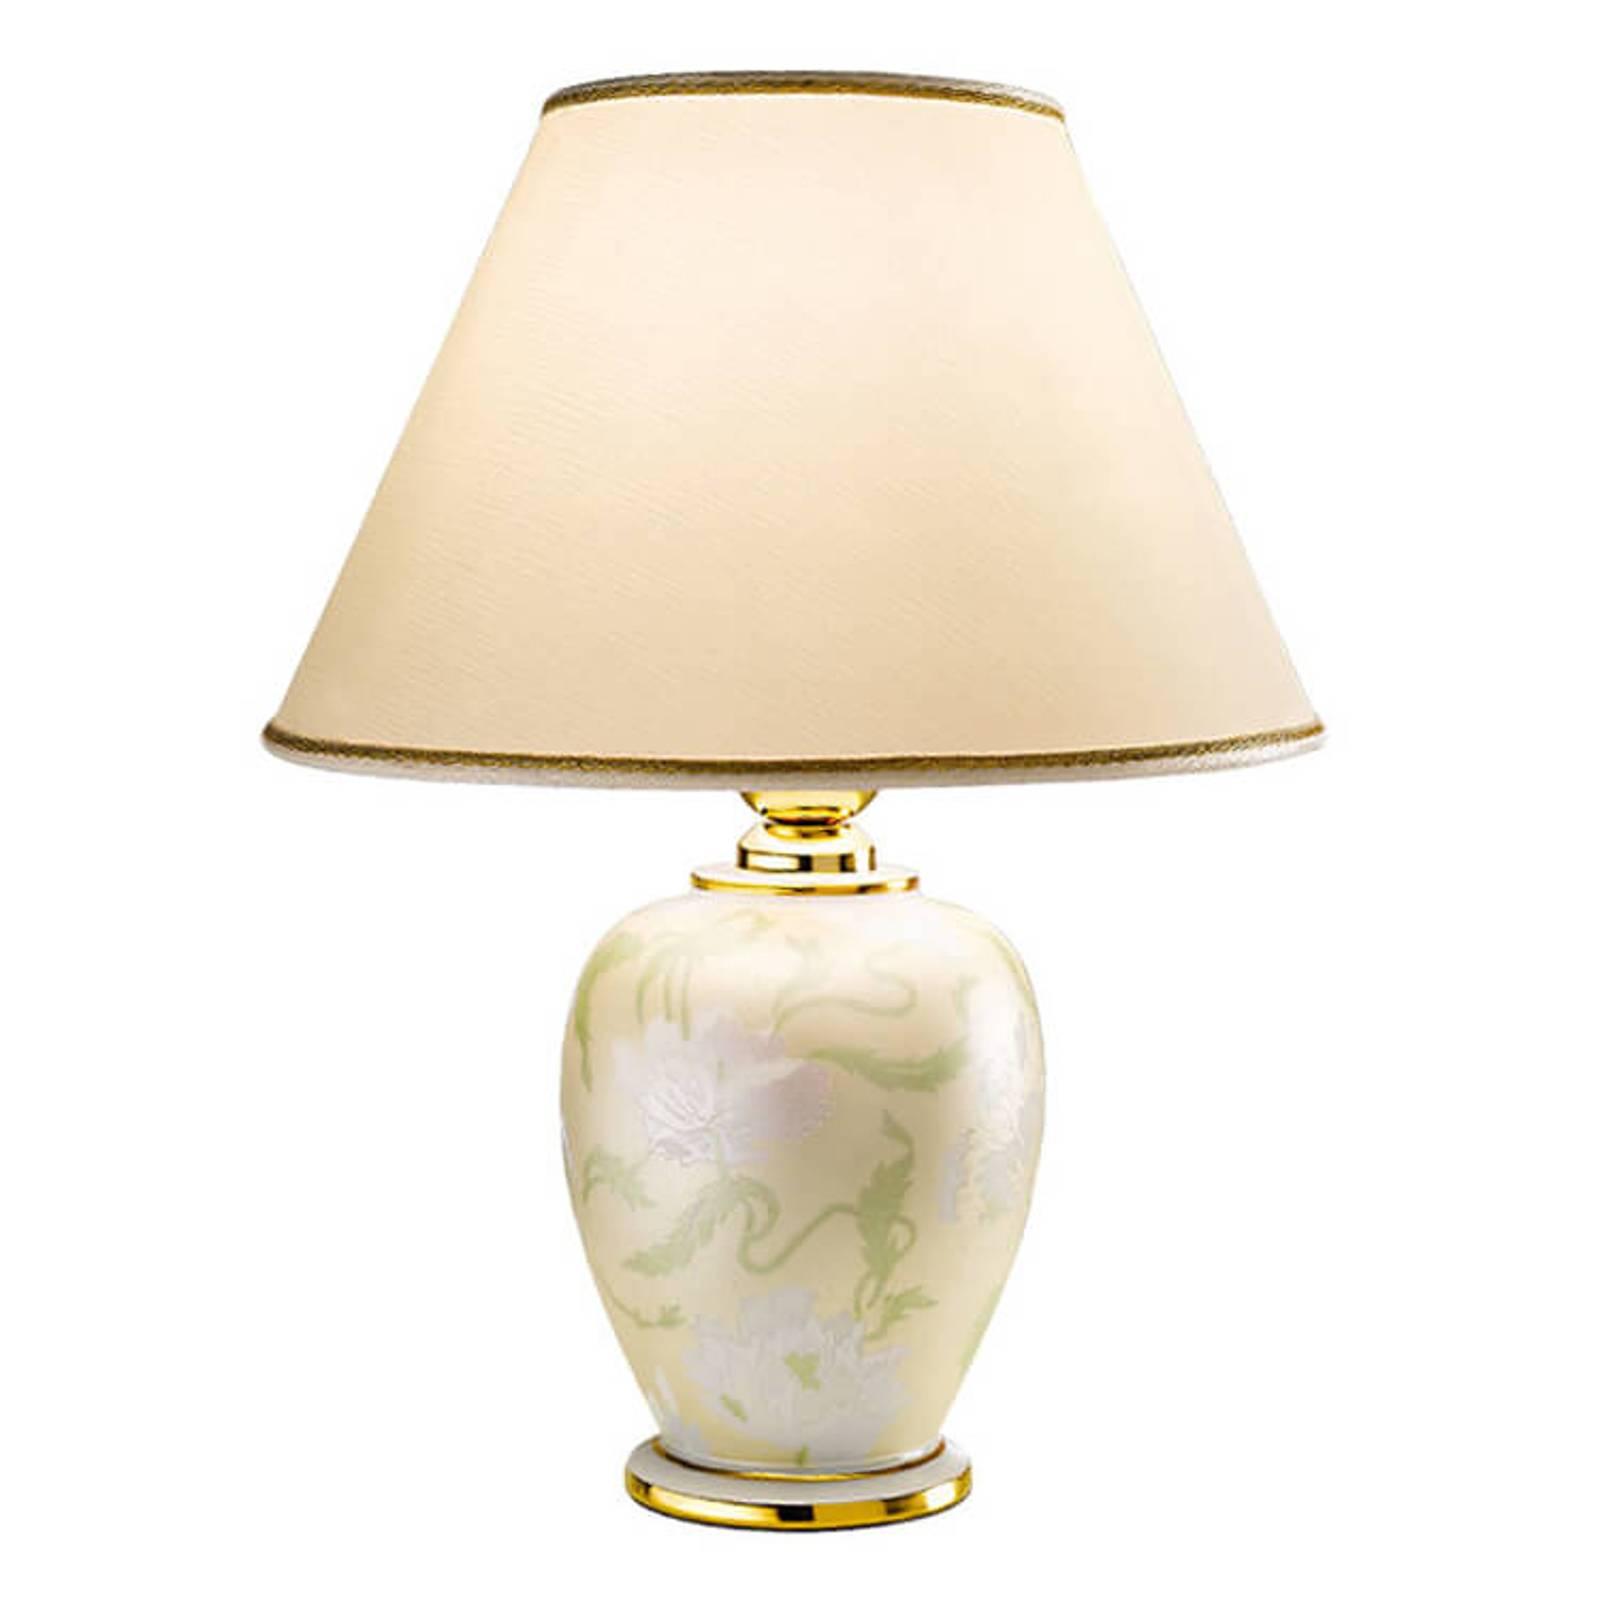 KOLARZ Giardino Perla - keramische tafellamp